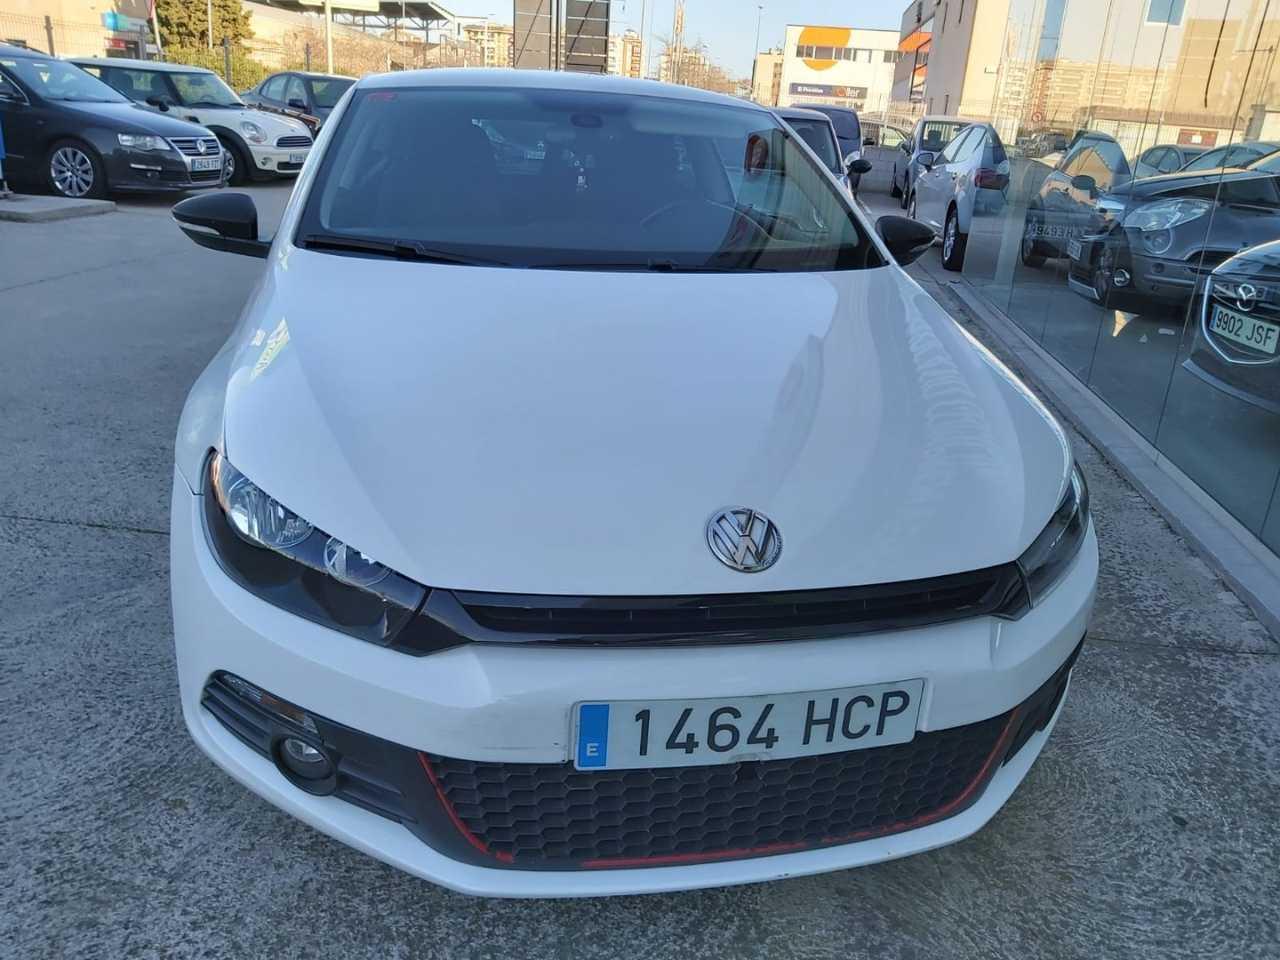 Volkswagen Scirocco 1.4 TSI 122cv Limited Edition   - Foto 1